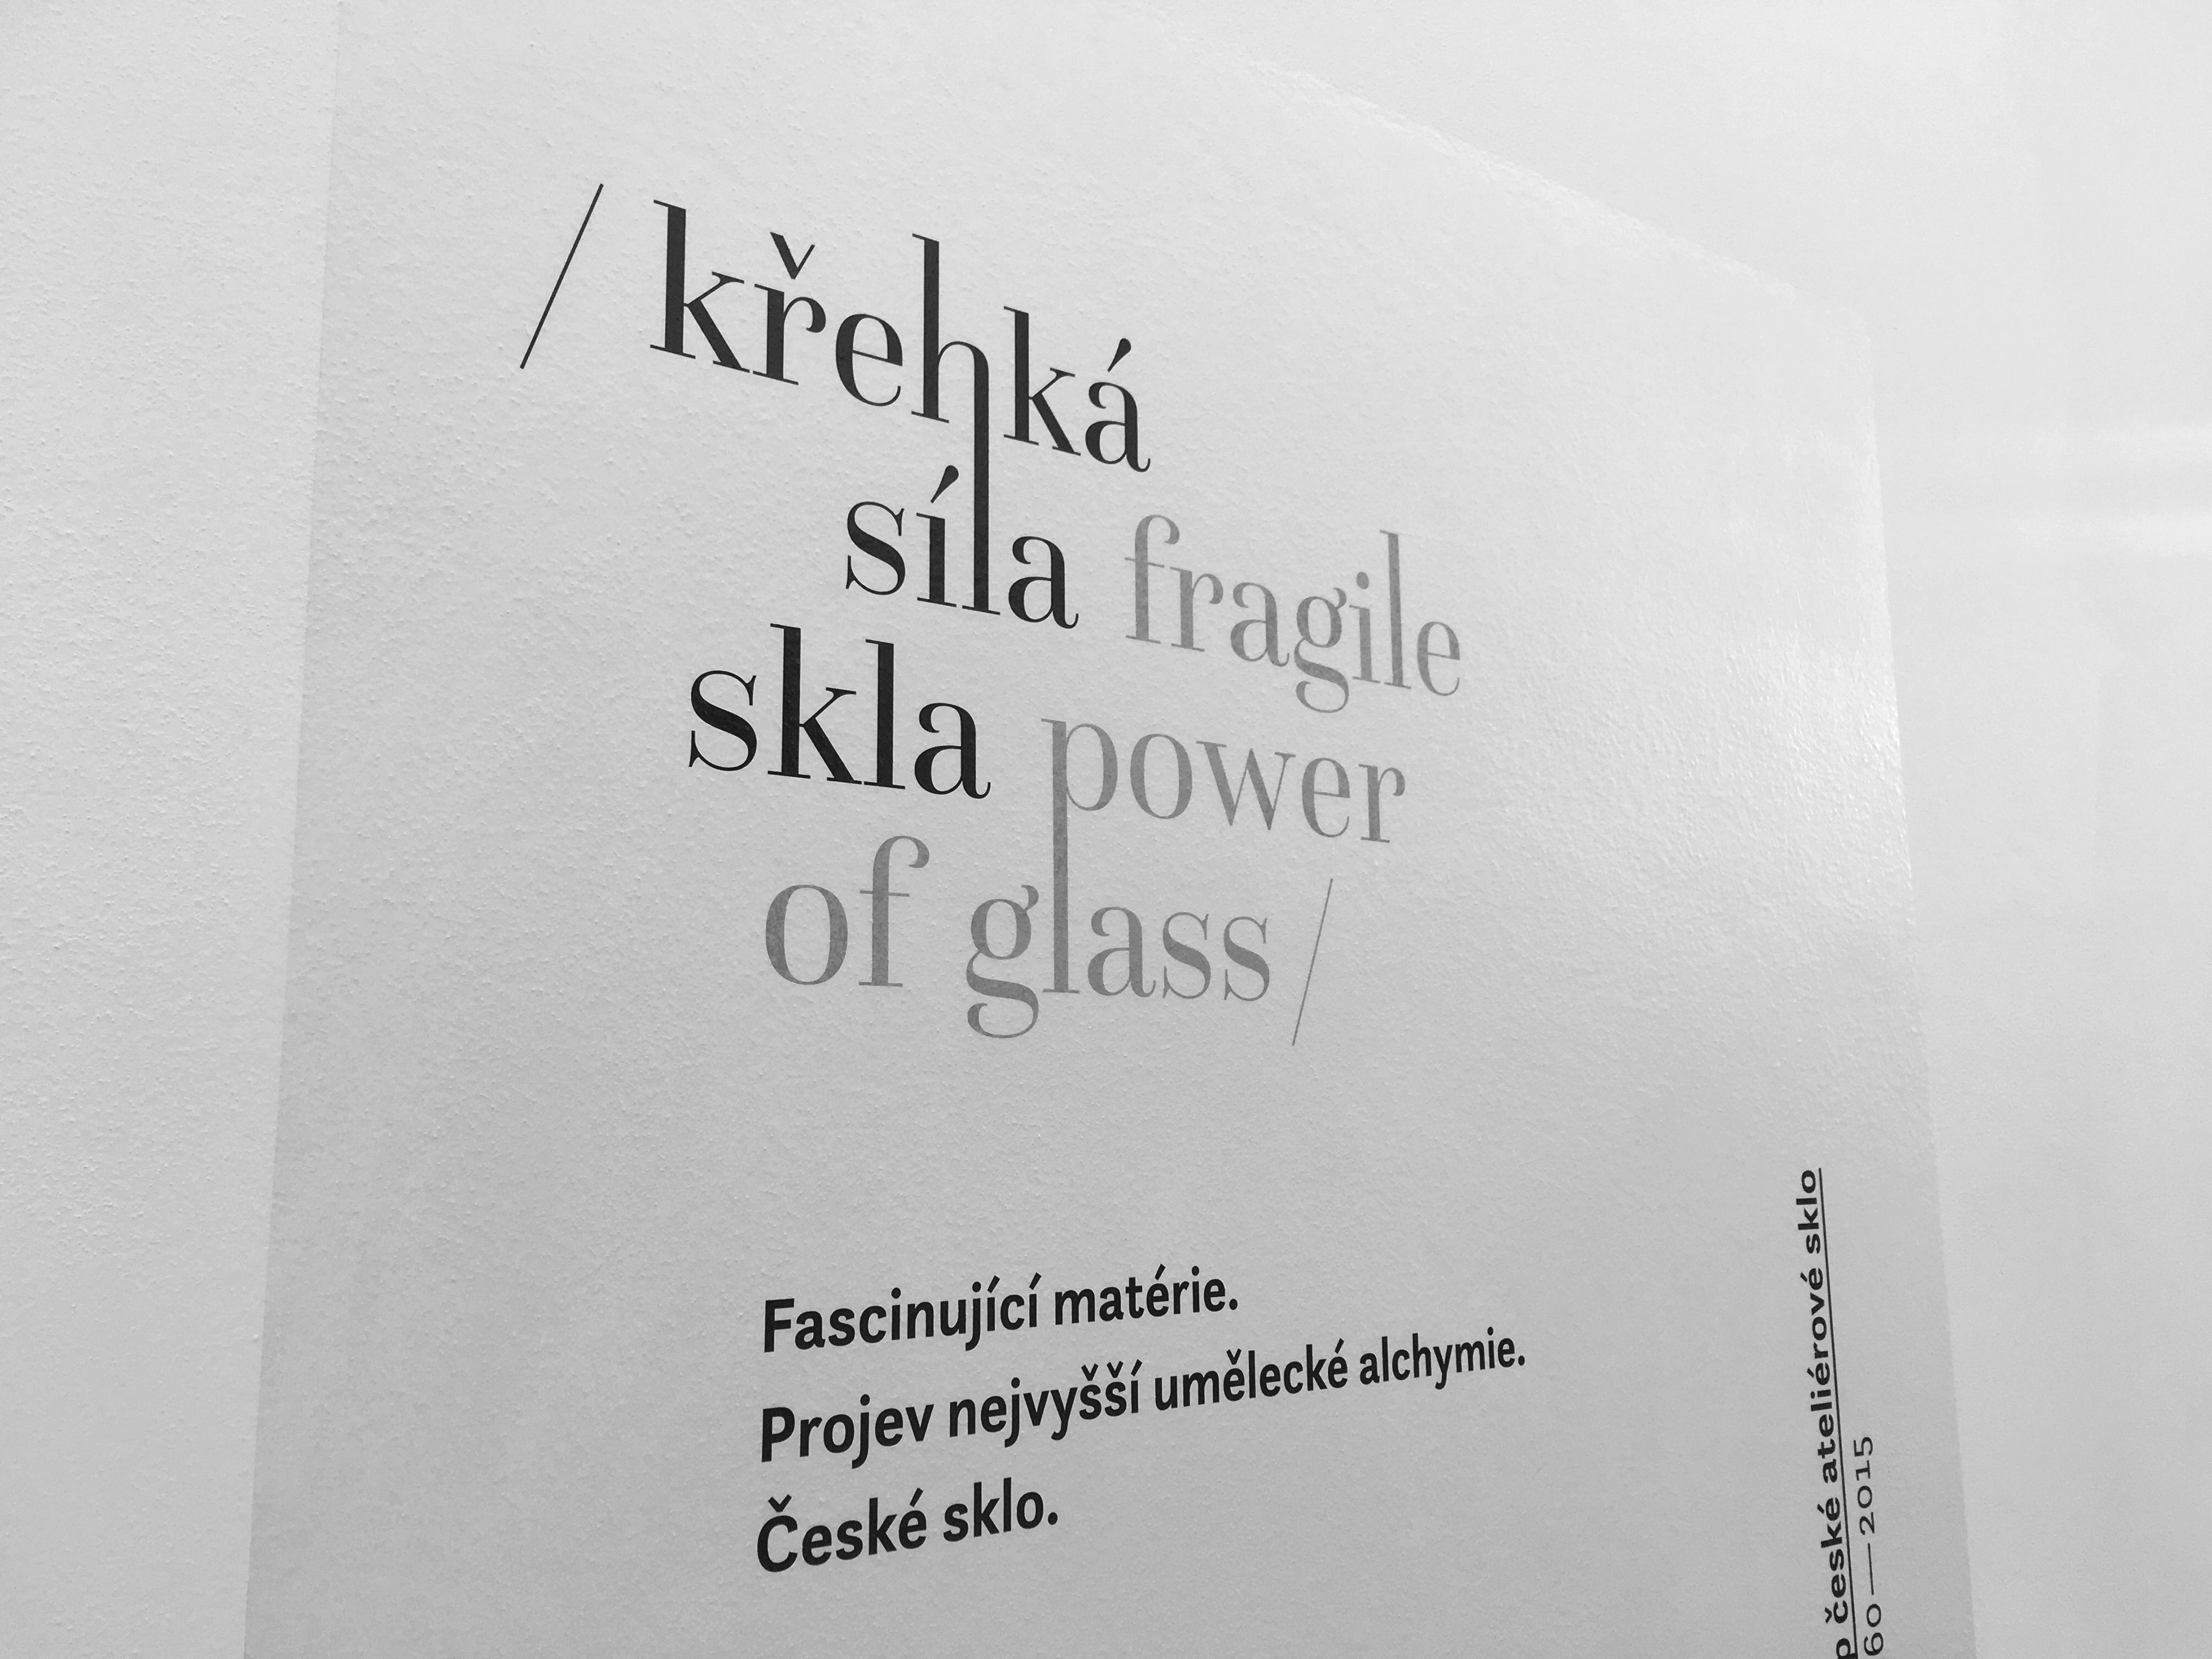 [album/Products_Model_Product/51/DOR_Krehka_sila_skla_vystava.jpg]